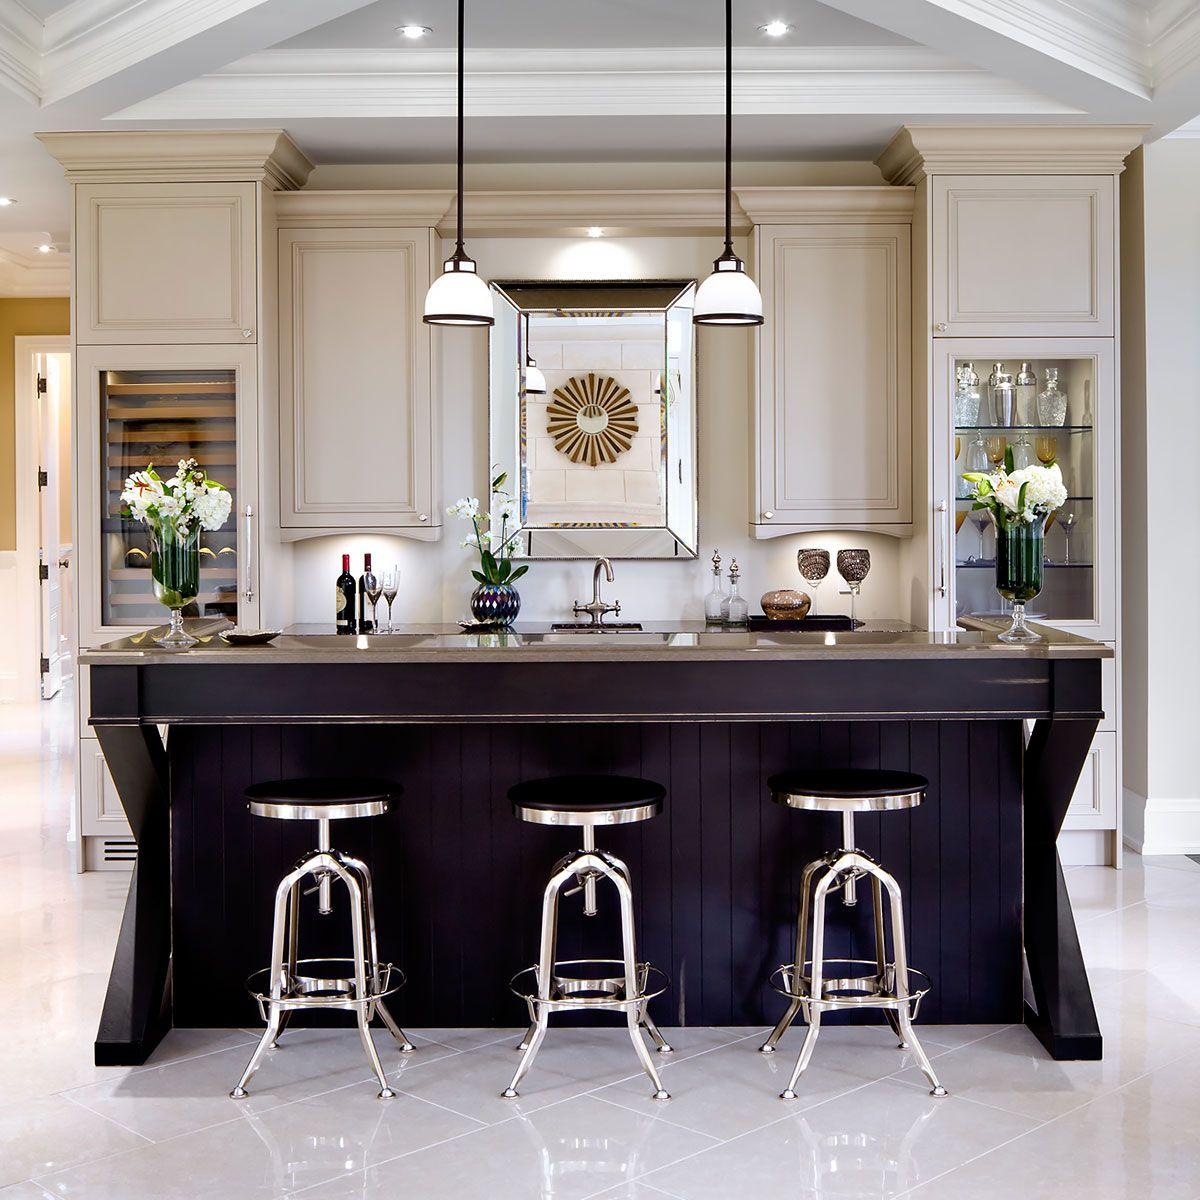 Interior Designed Kitchens Casagiardino ♛ Kitchens  Jane Lockhart Interior Design